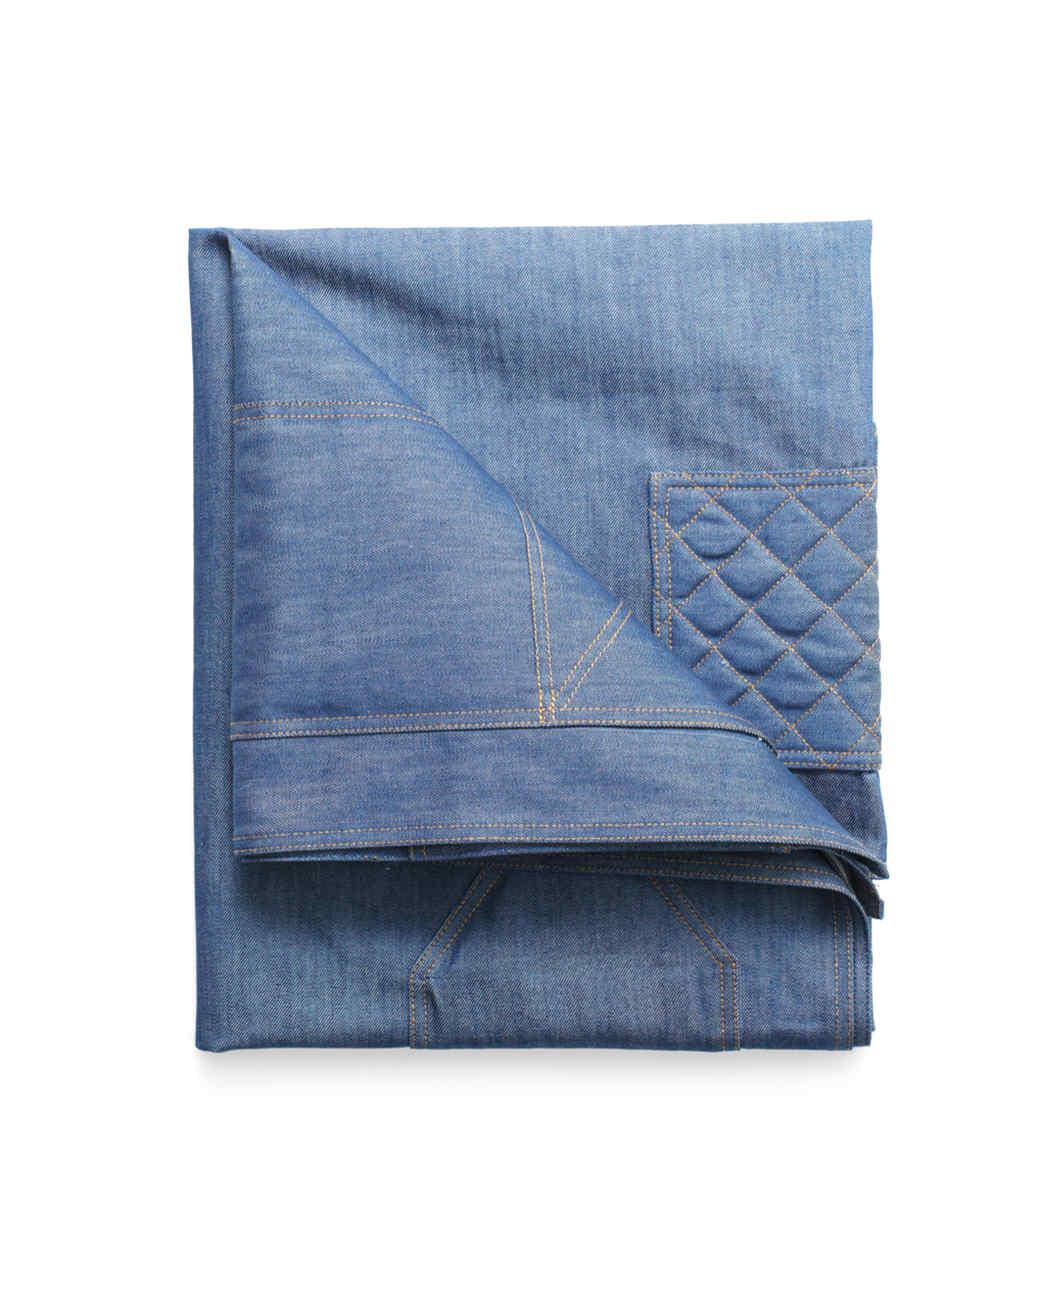 picnic-blanket-mld108718.jpg